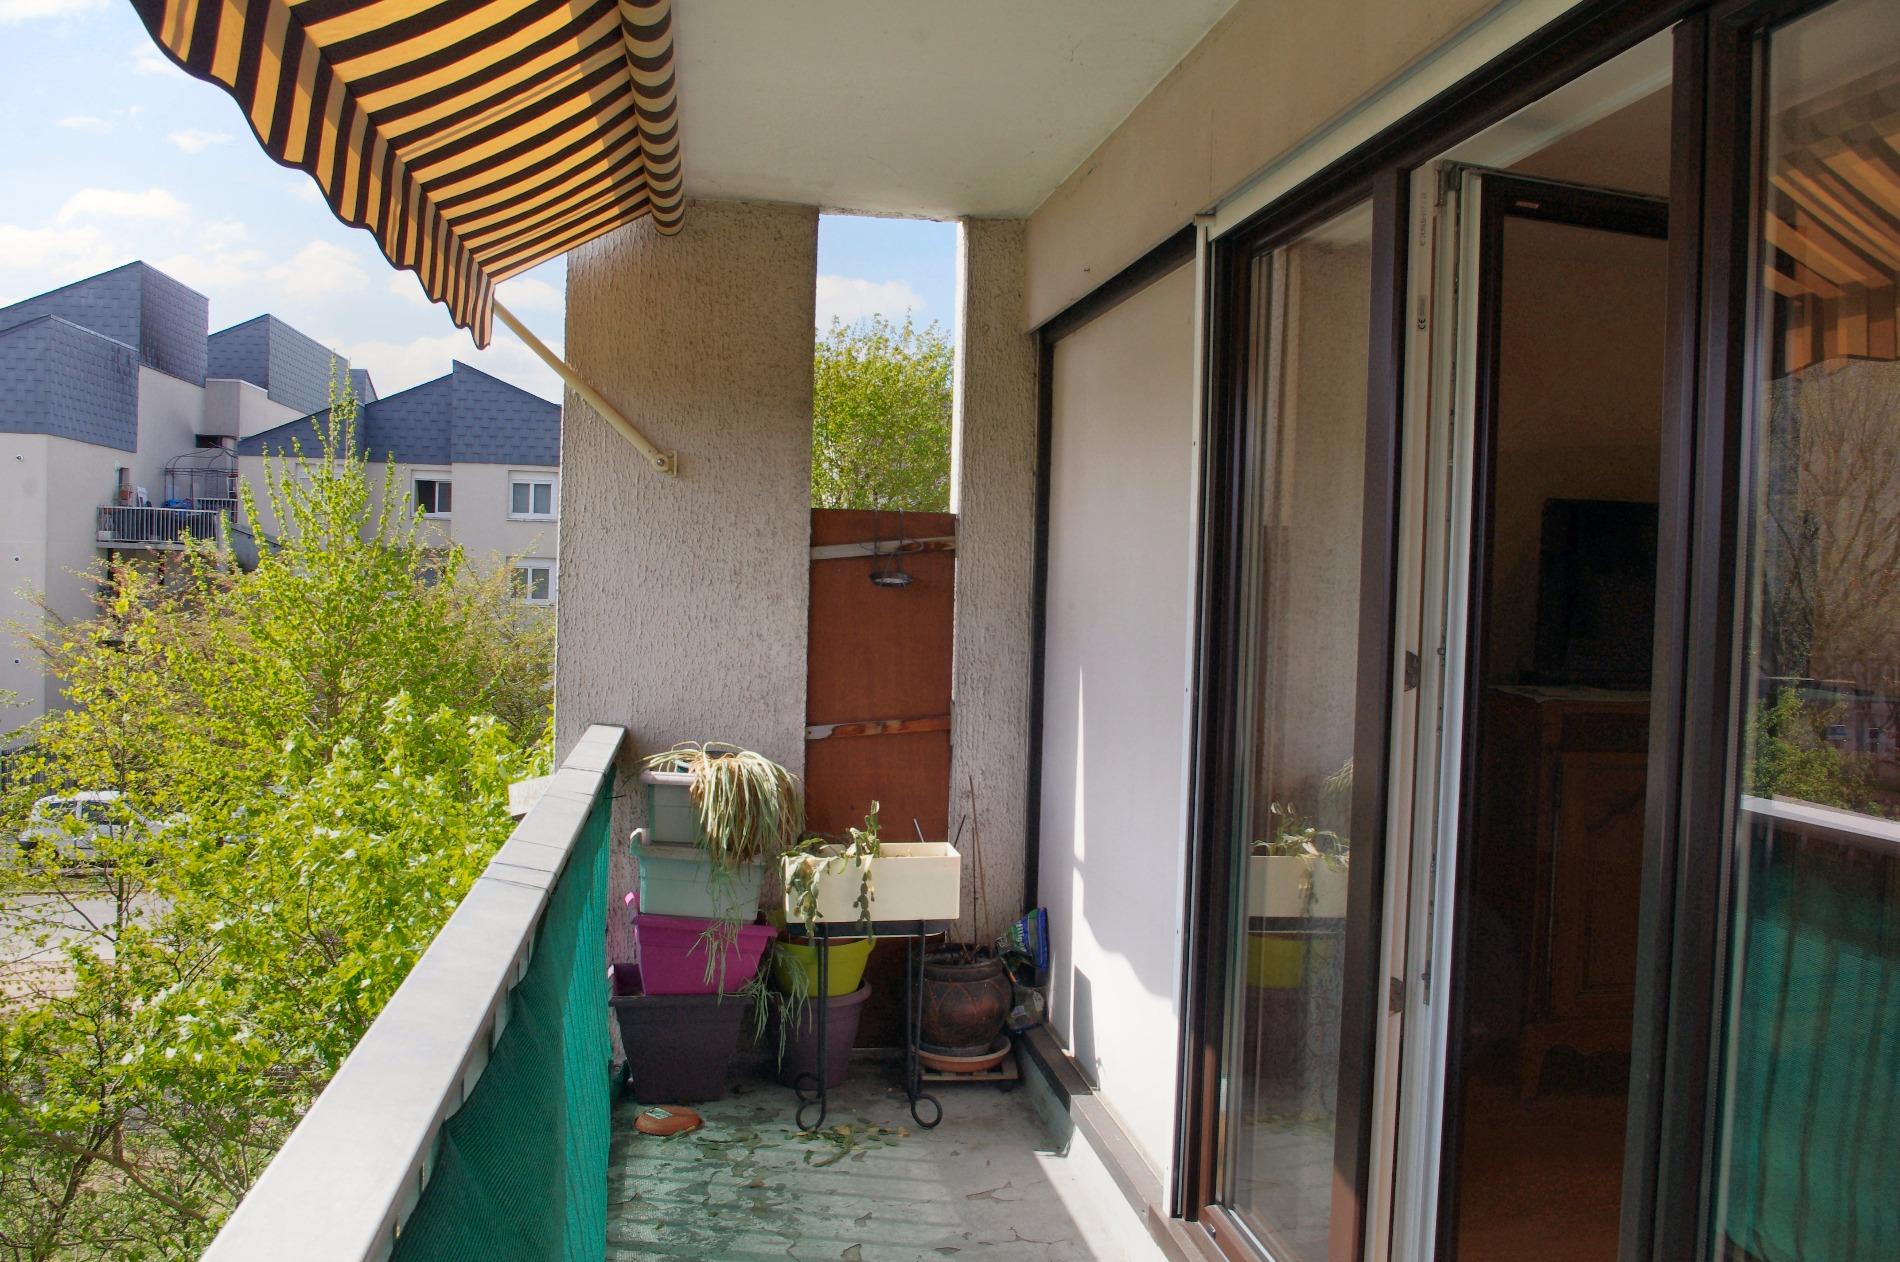 Vente appartement de 70 m2 taverny for Location garage gex